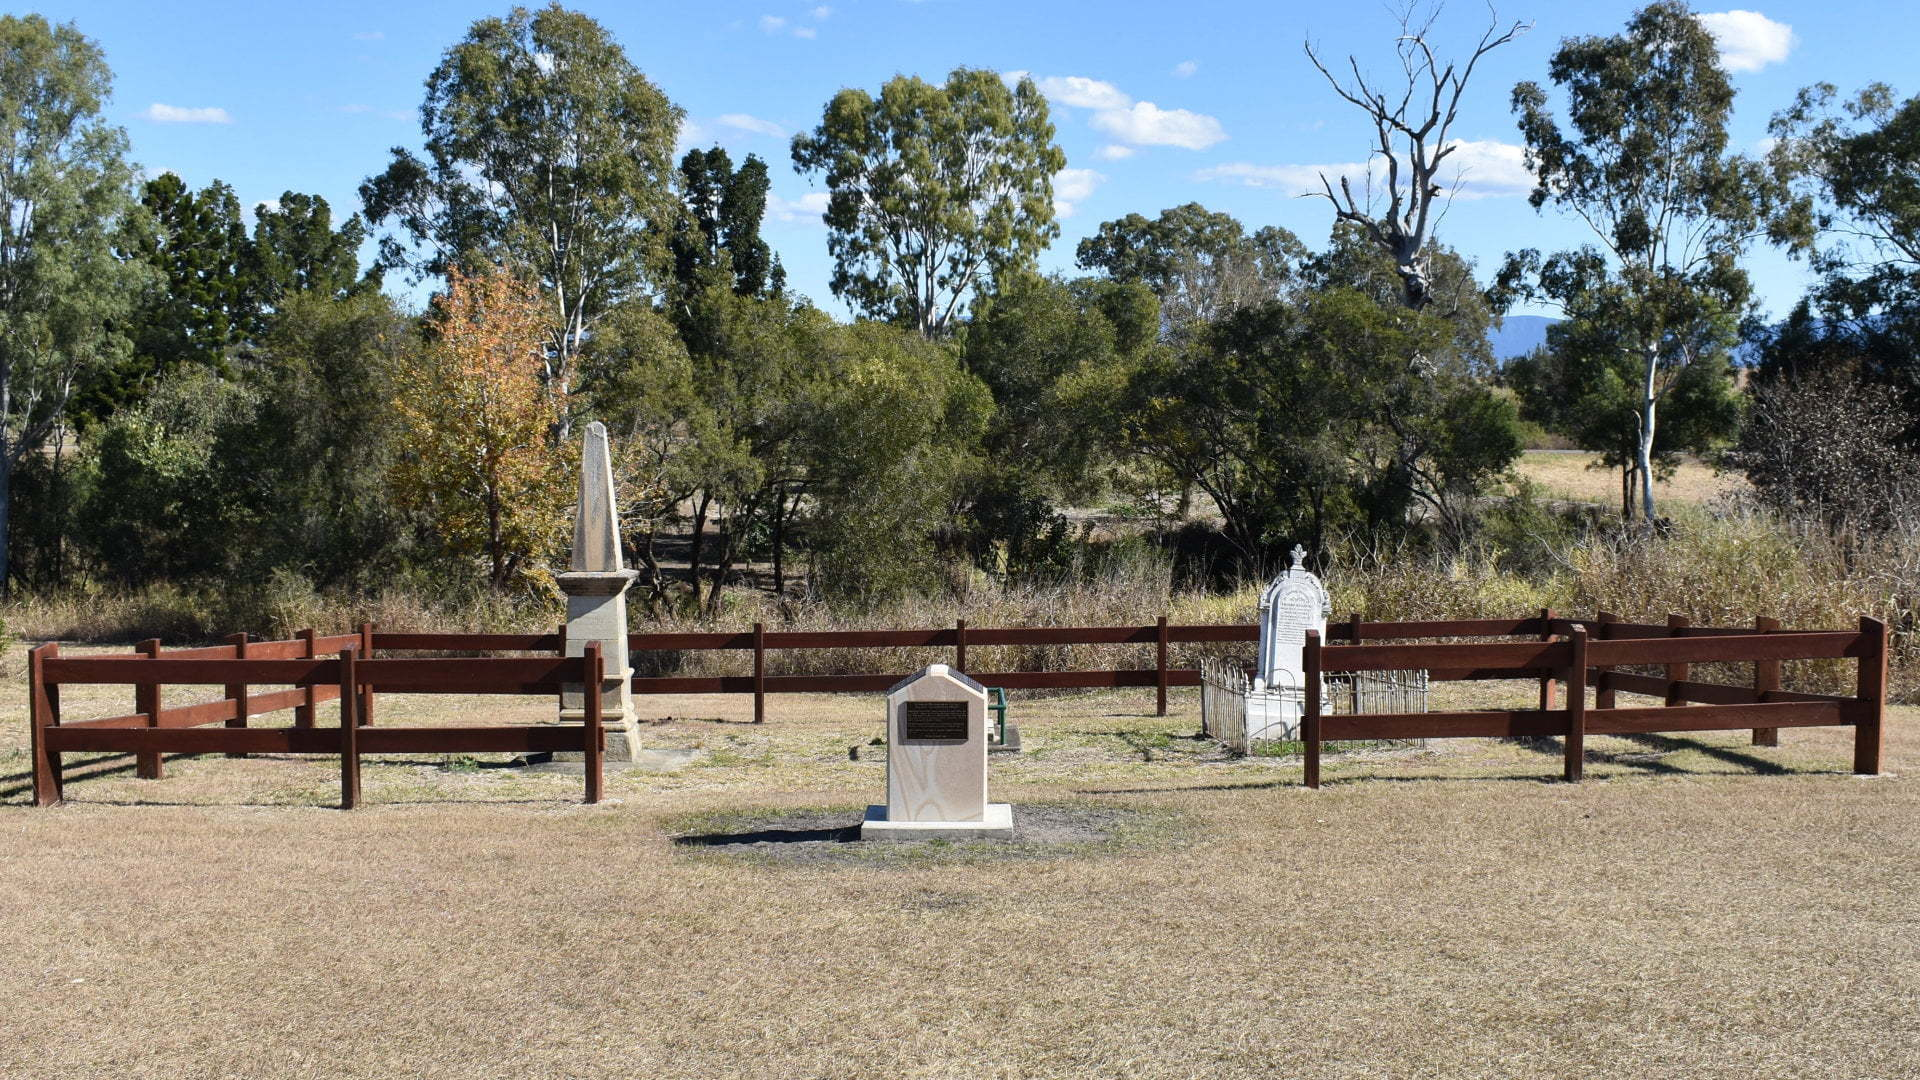 Pioneer Graves fenced in area, memorial in front. Graves of pioneers in the Fassifern area, Alexander Balbi, Sarah Campbell Mercer, and Anders Nielsen